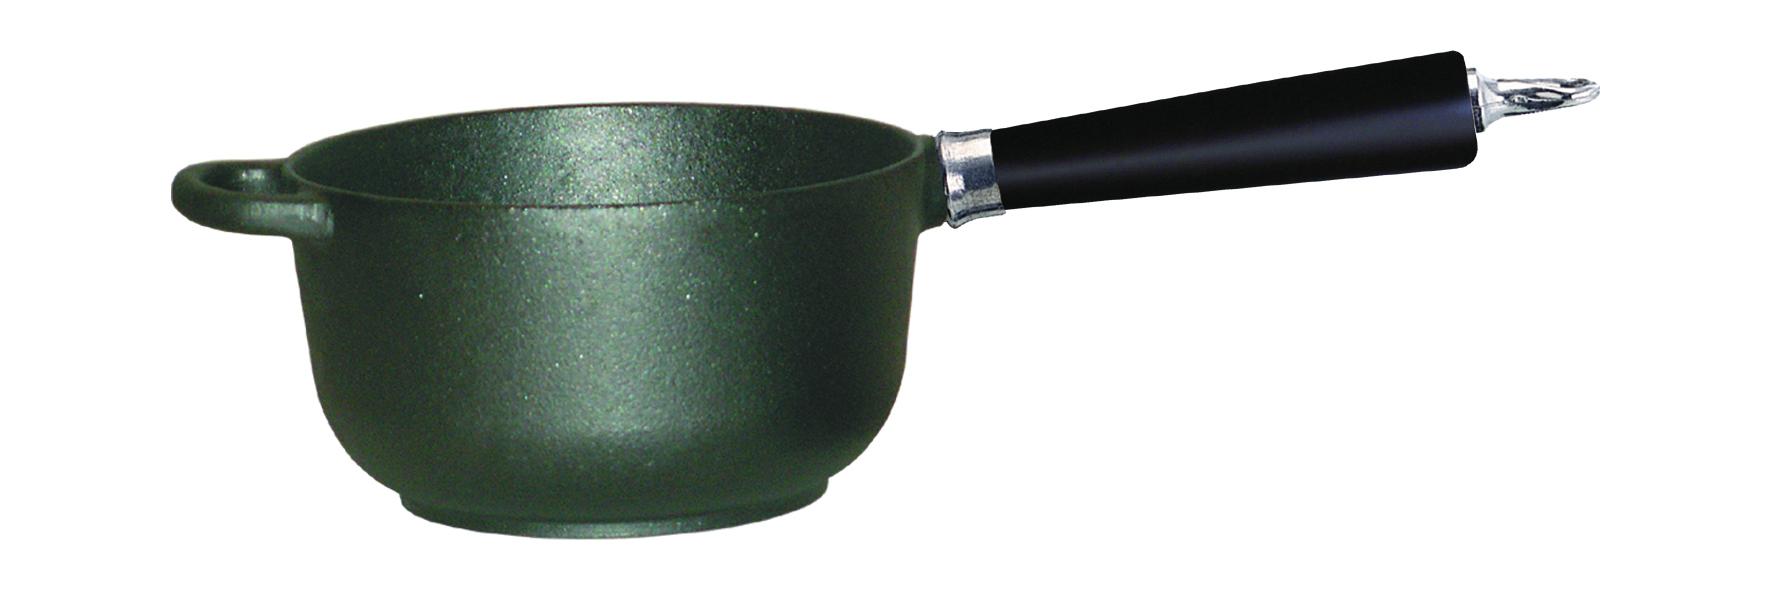 Maestro Sauce Pan 145070